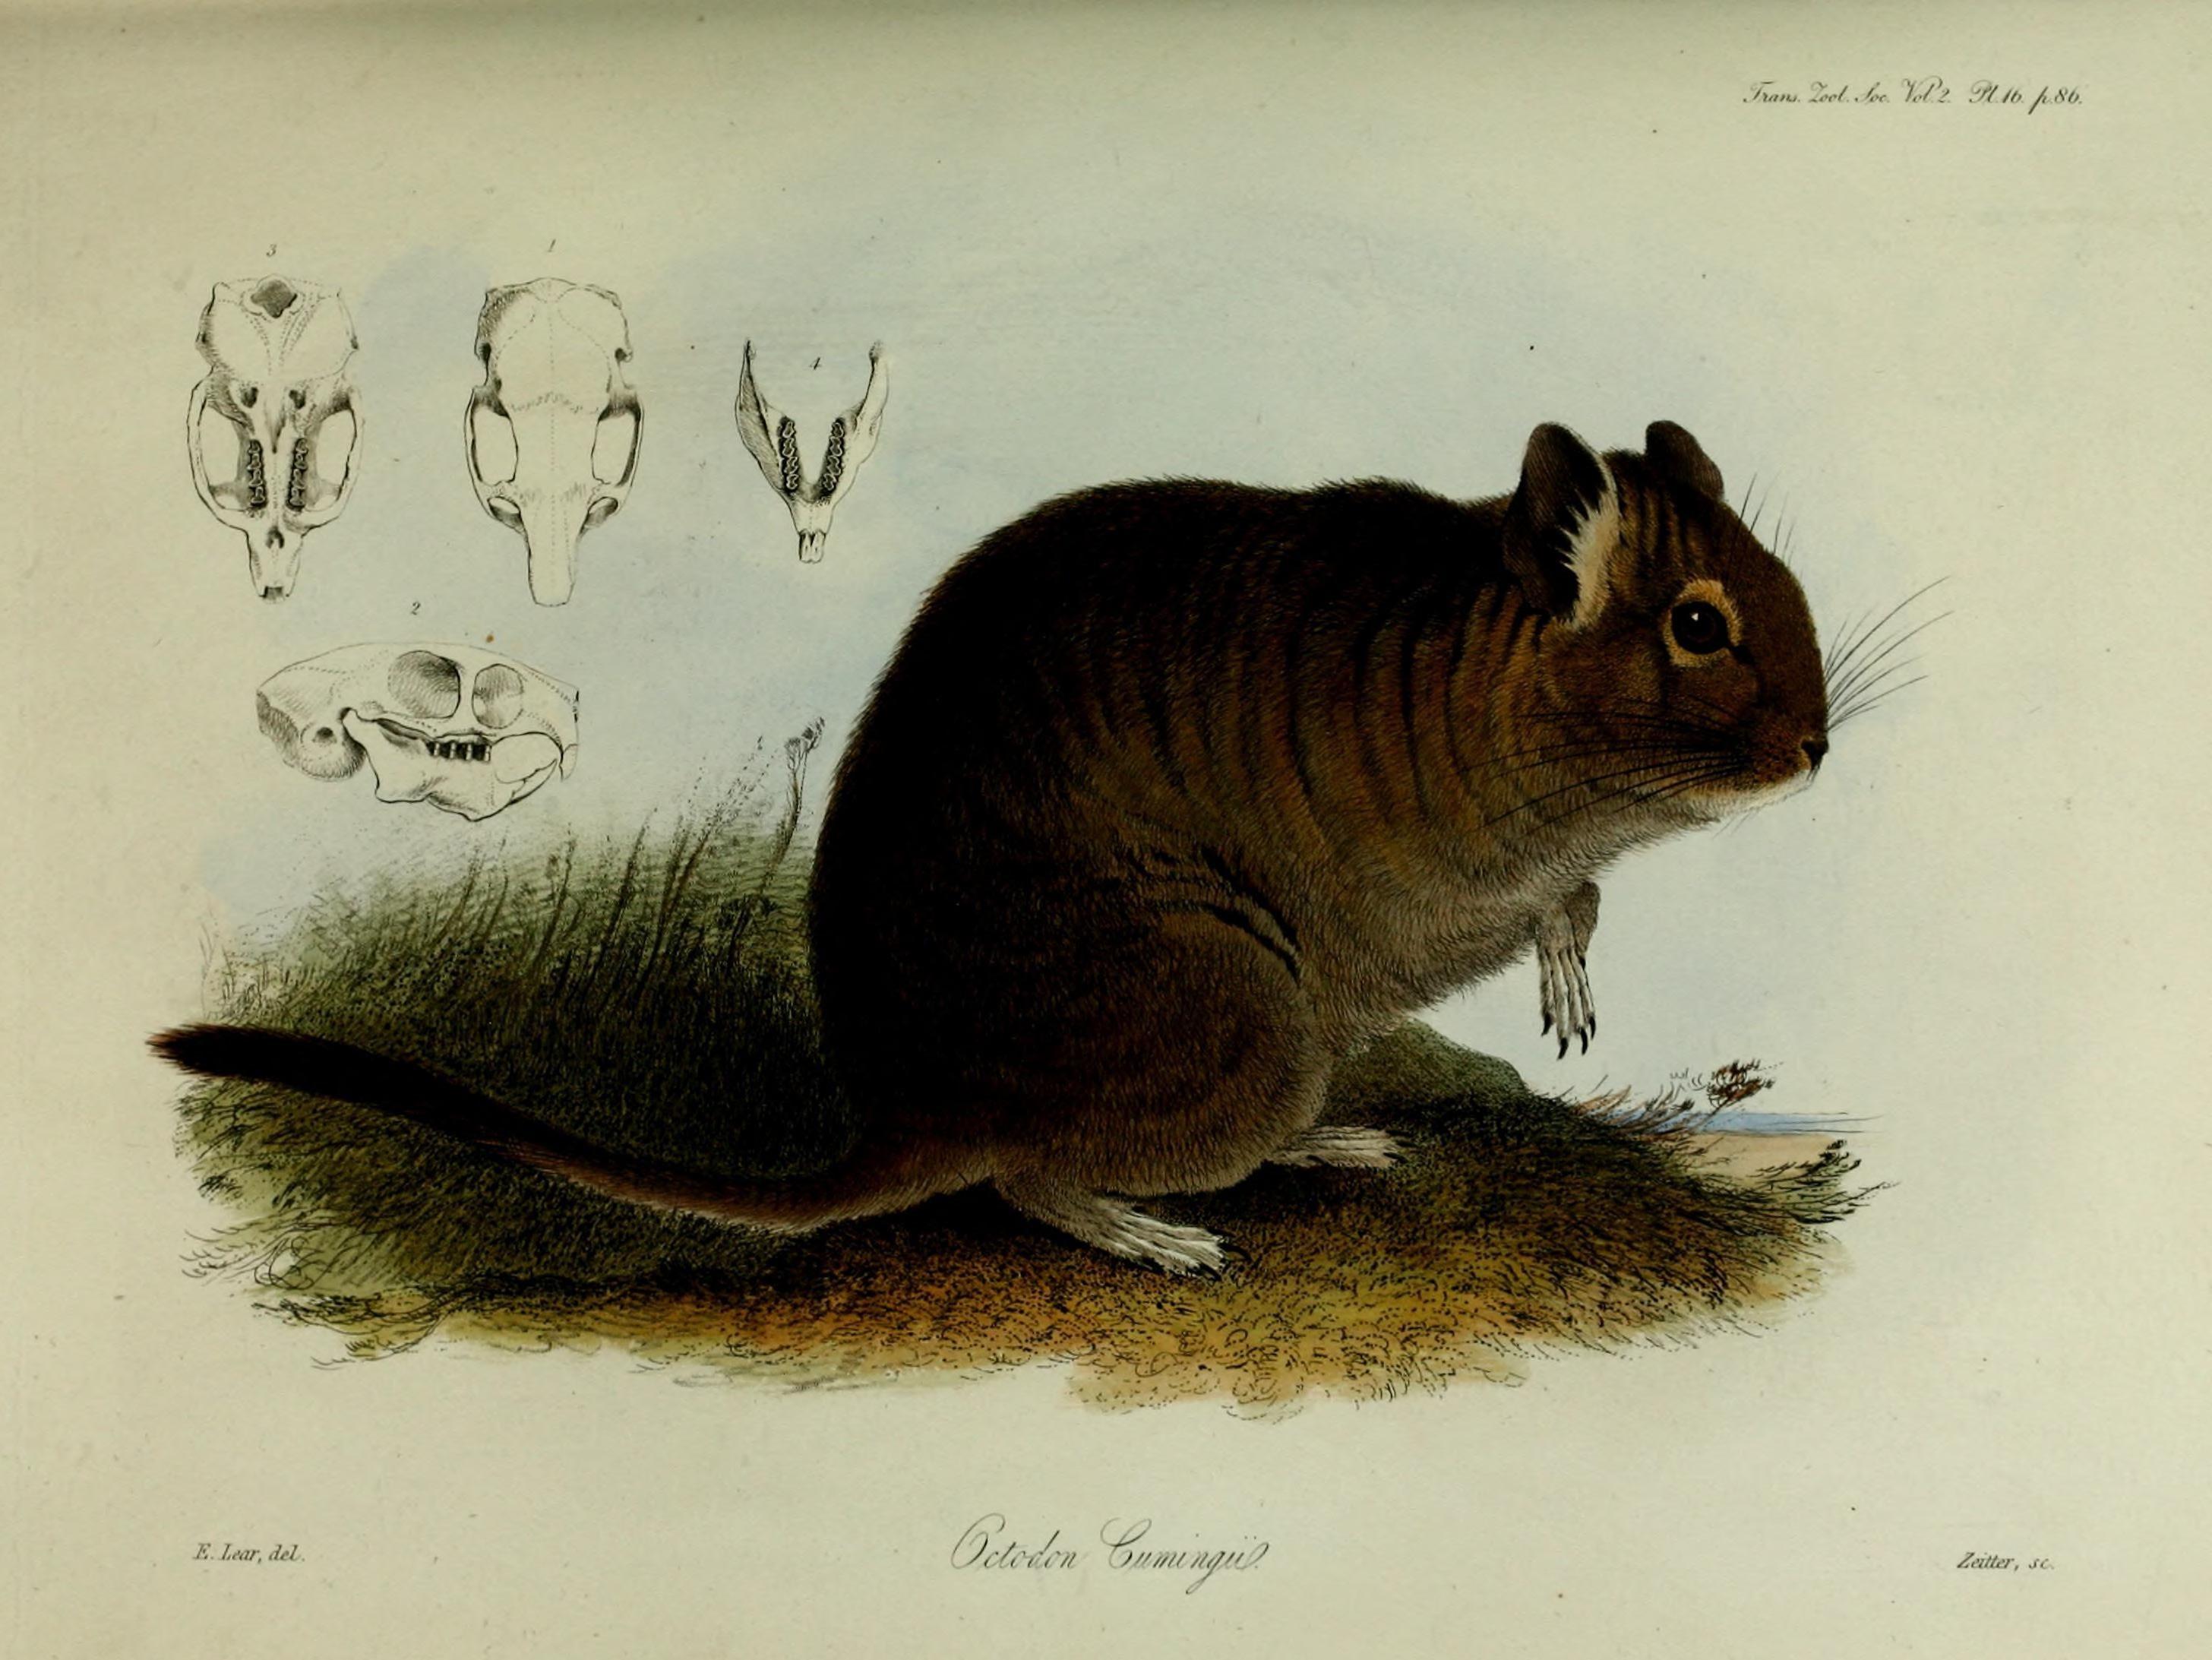 Image of degu